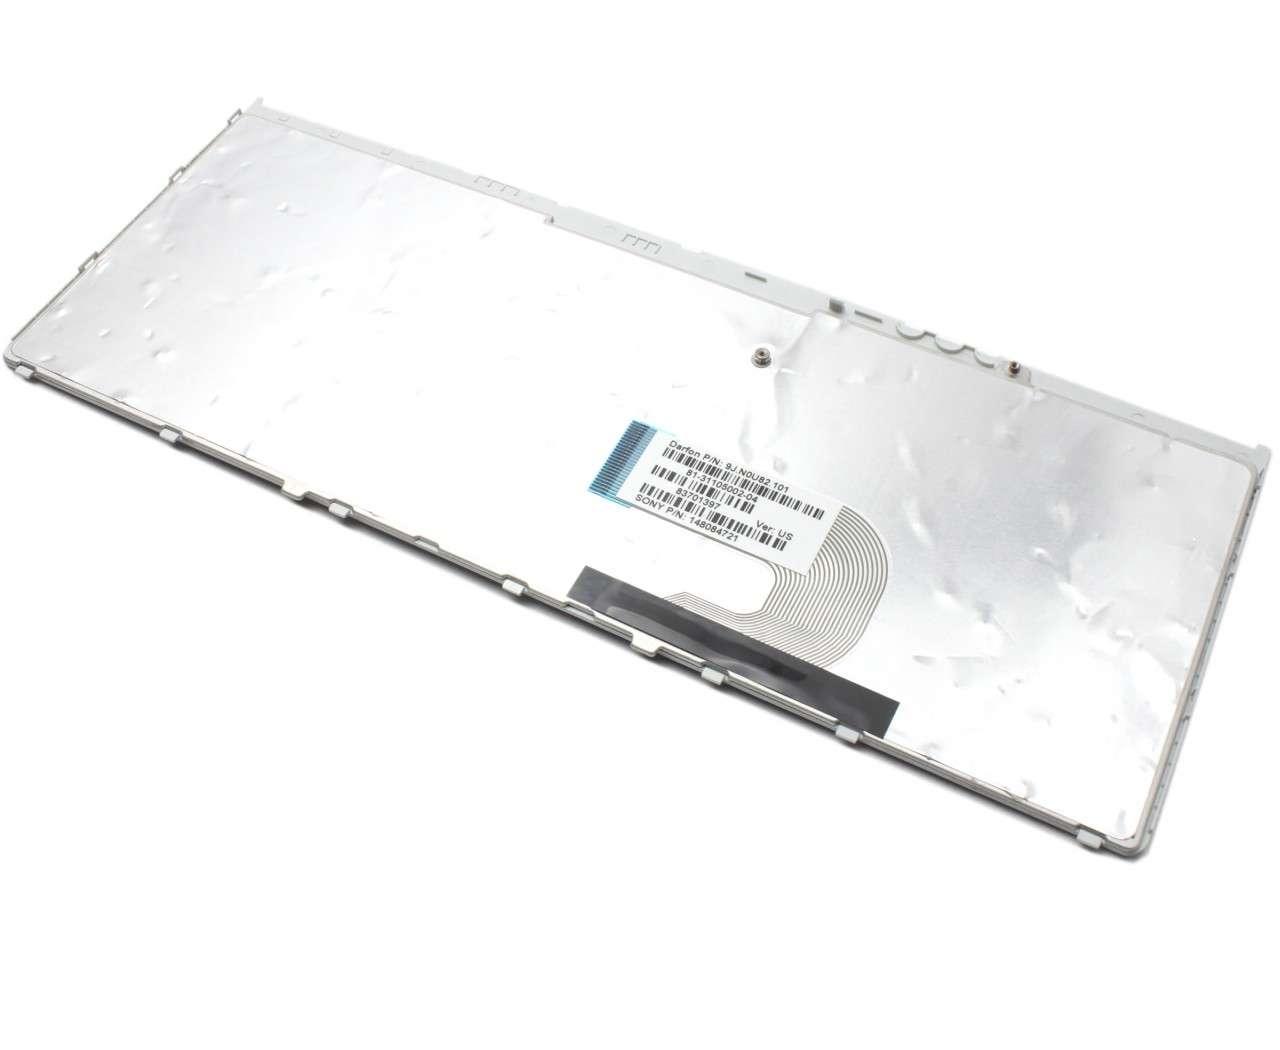 Tastatura Sony Vaio VGN-FW11M neagra cu rama gri imagine powerlaptop.ro 2021